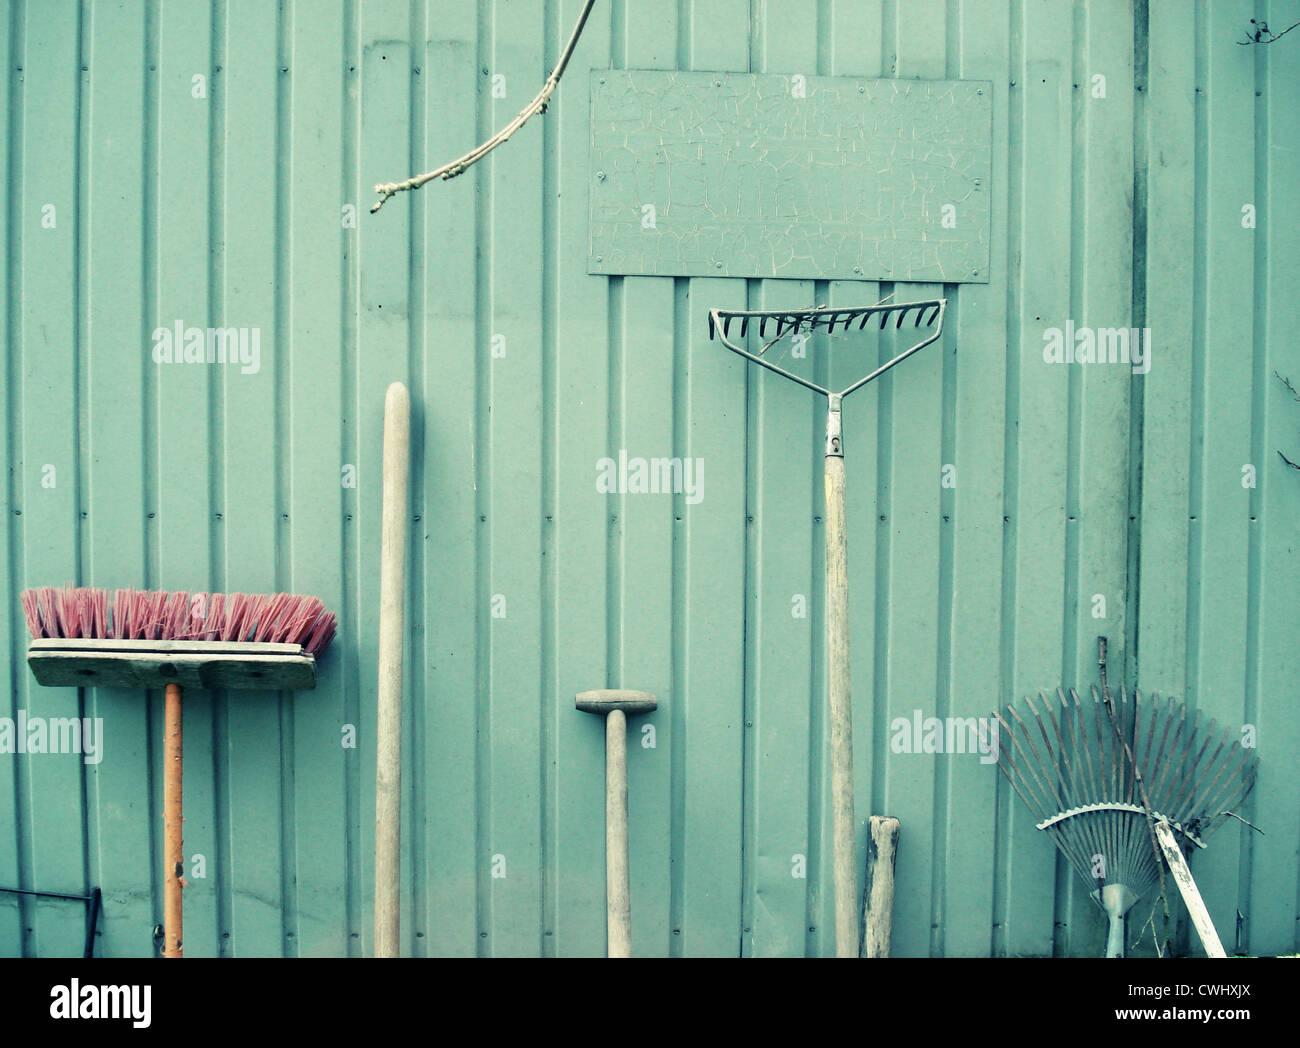 gardening,garden equipment,parked - Stock Image